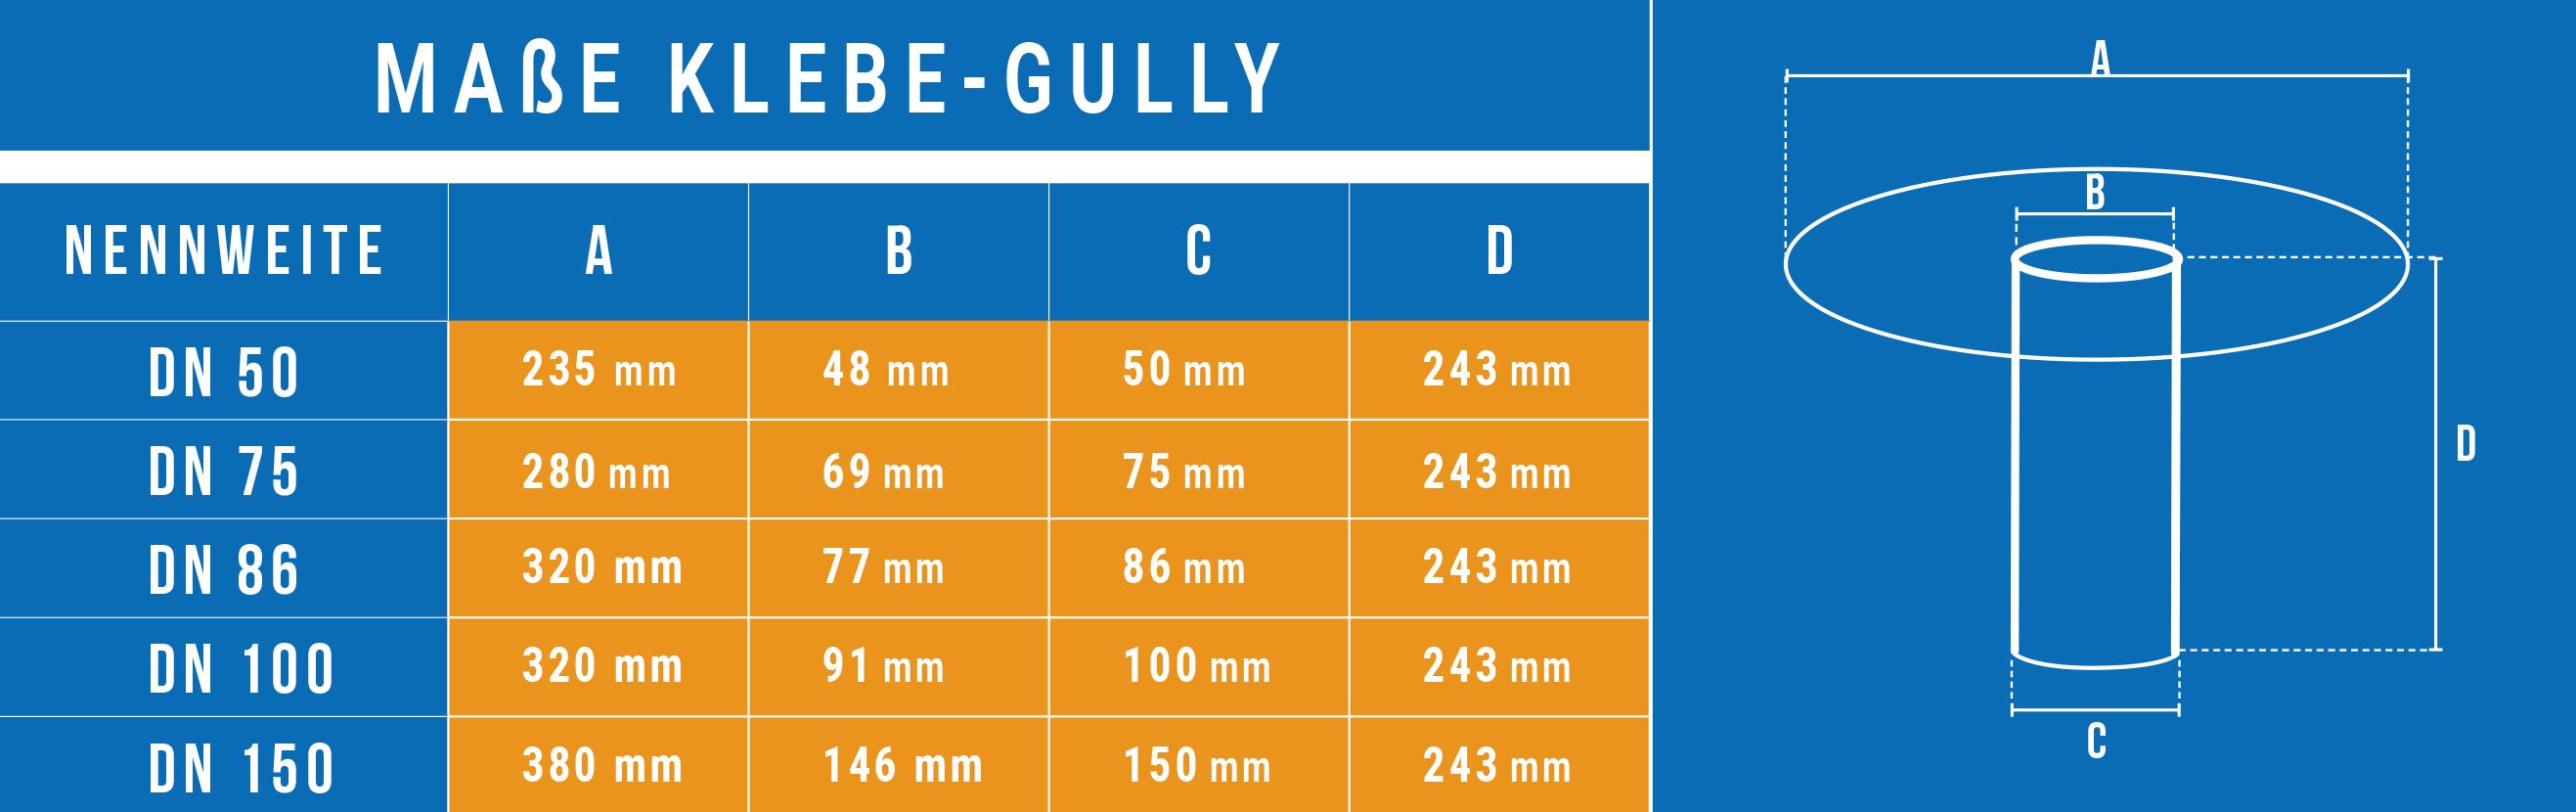 Klebe-Gully